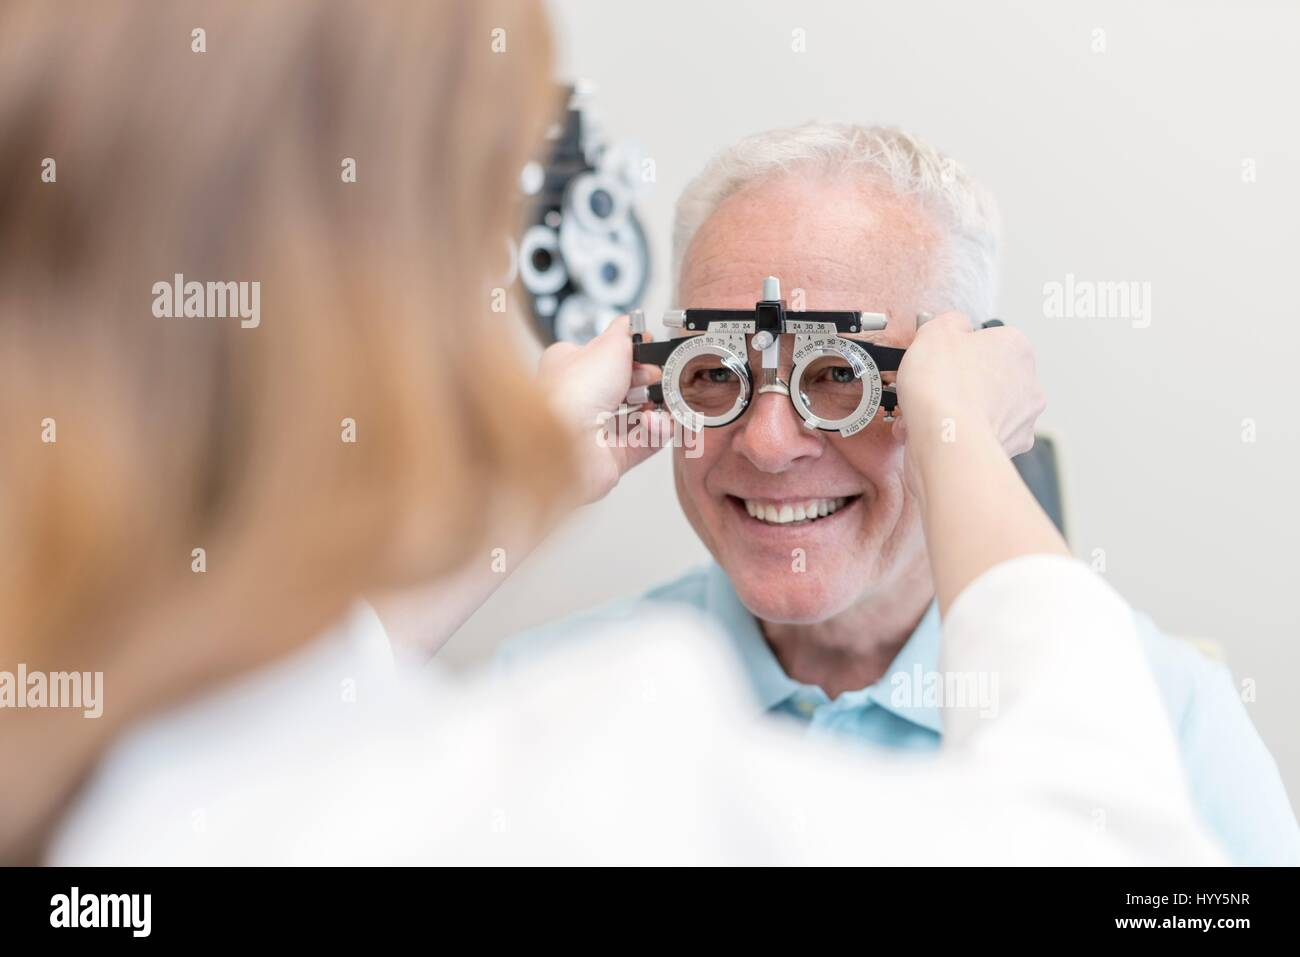 Optician testing man's eyesight. - Stock Image